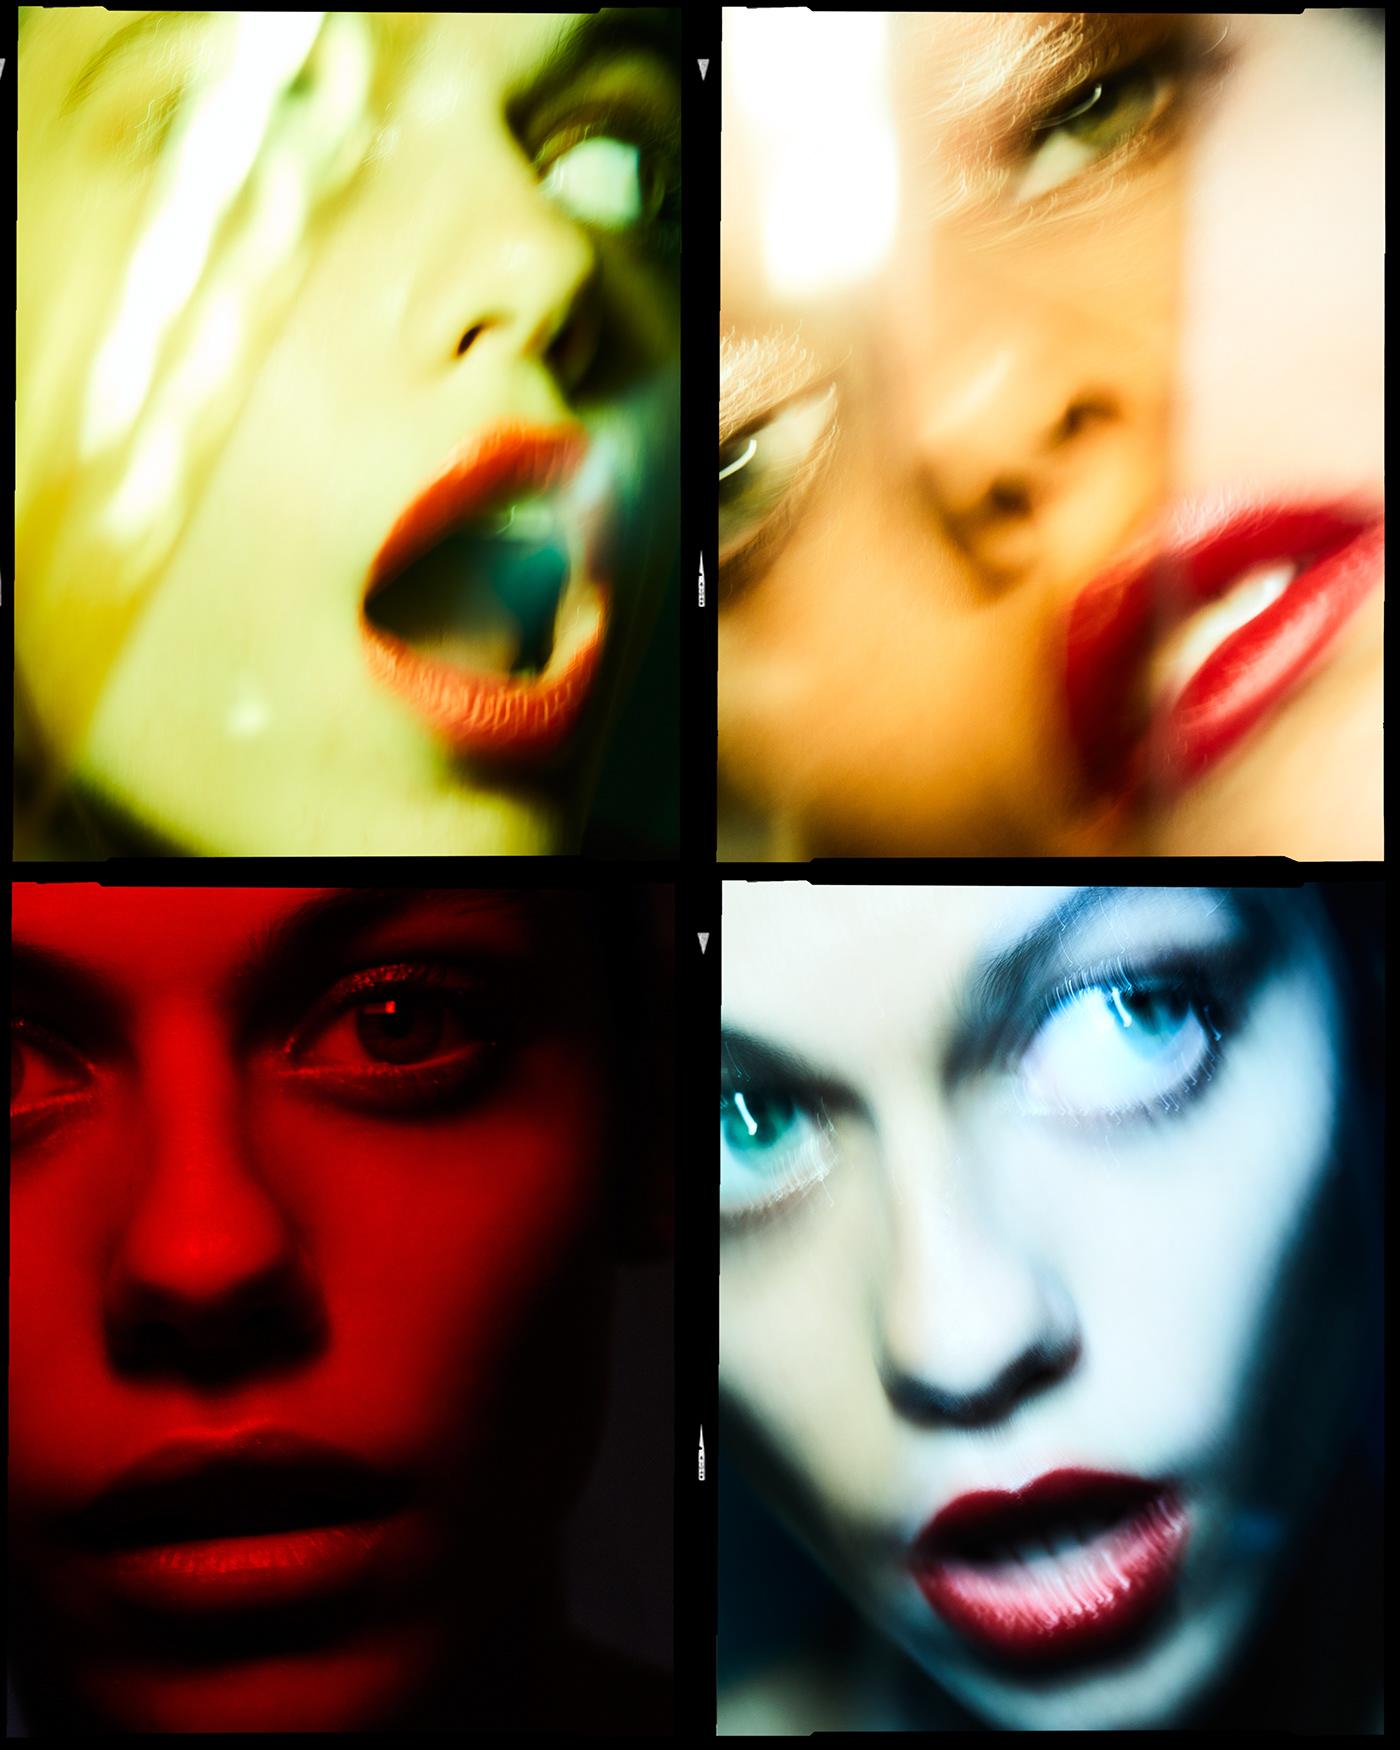 Image may contain: face, human face and eyes